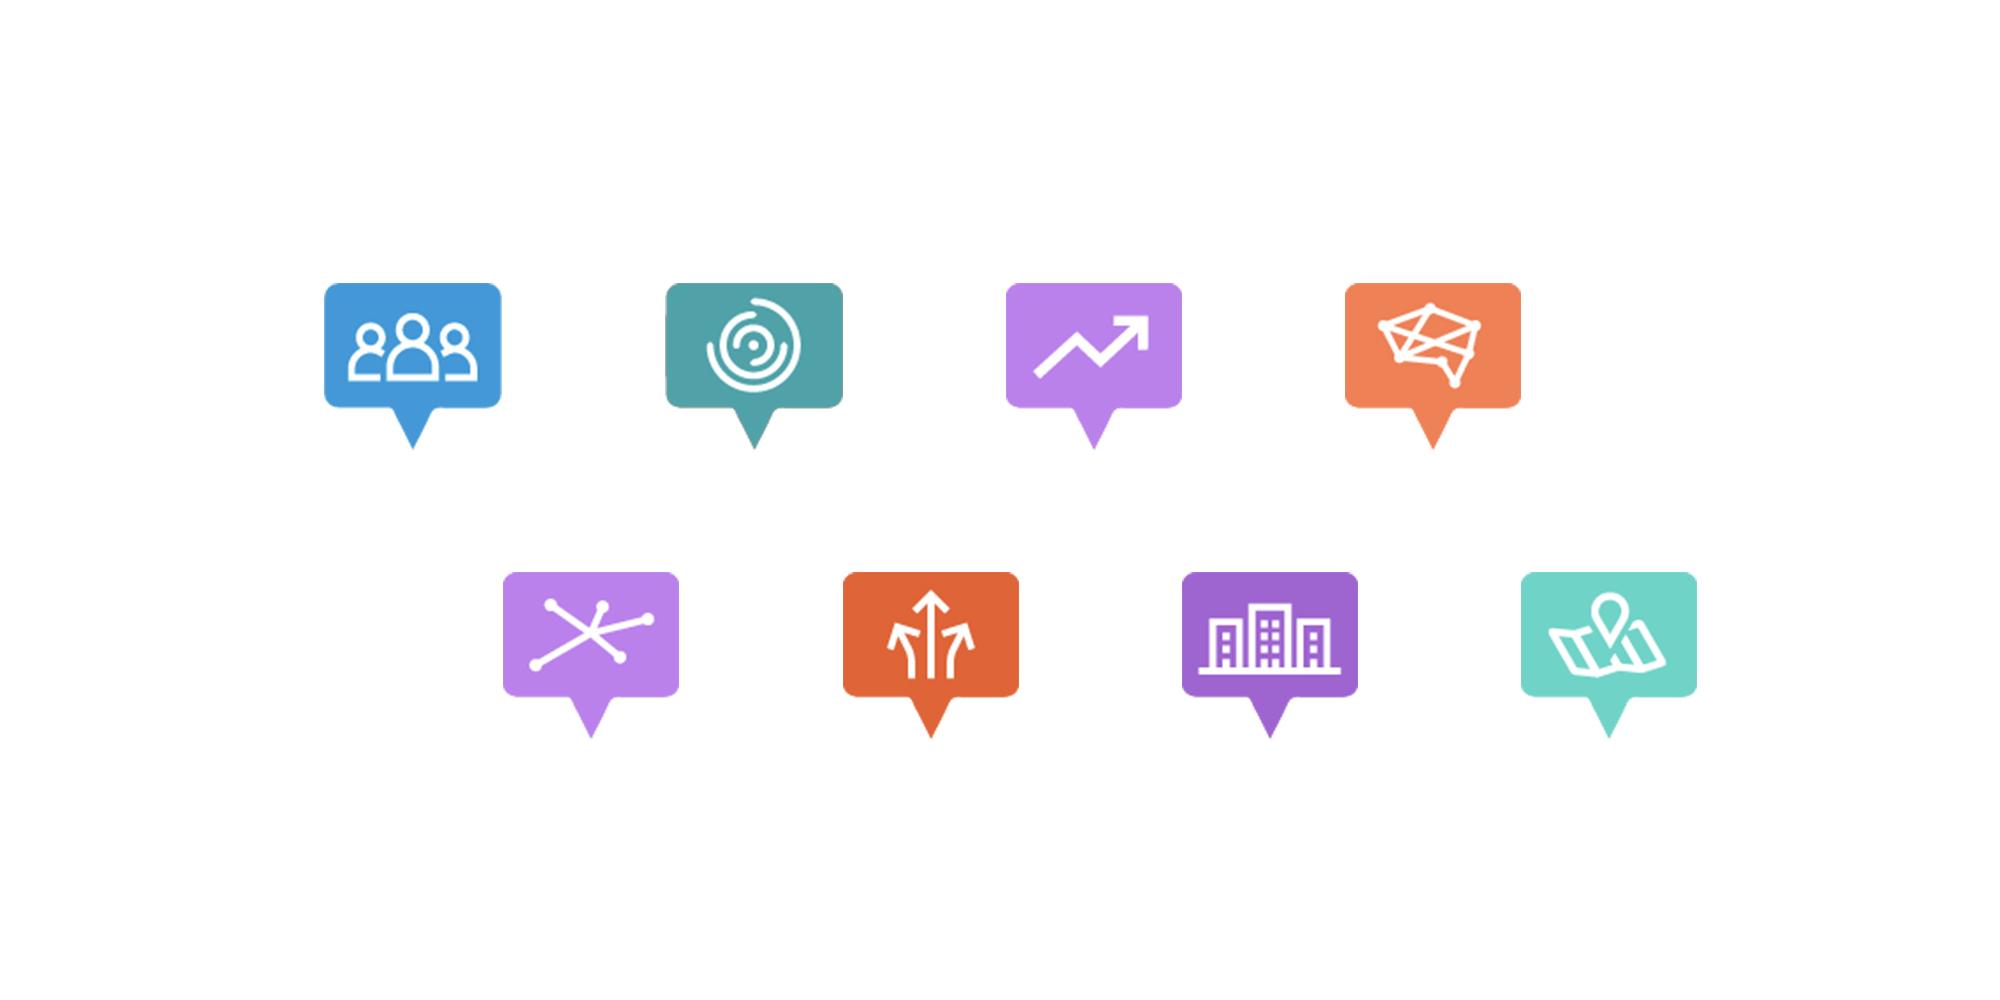 allegiant-icons.jpg